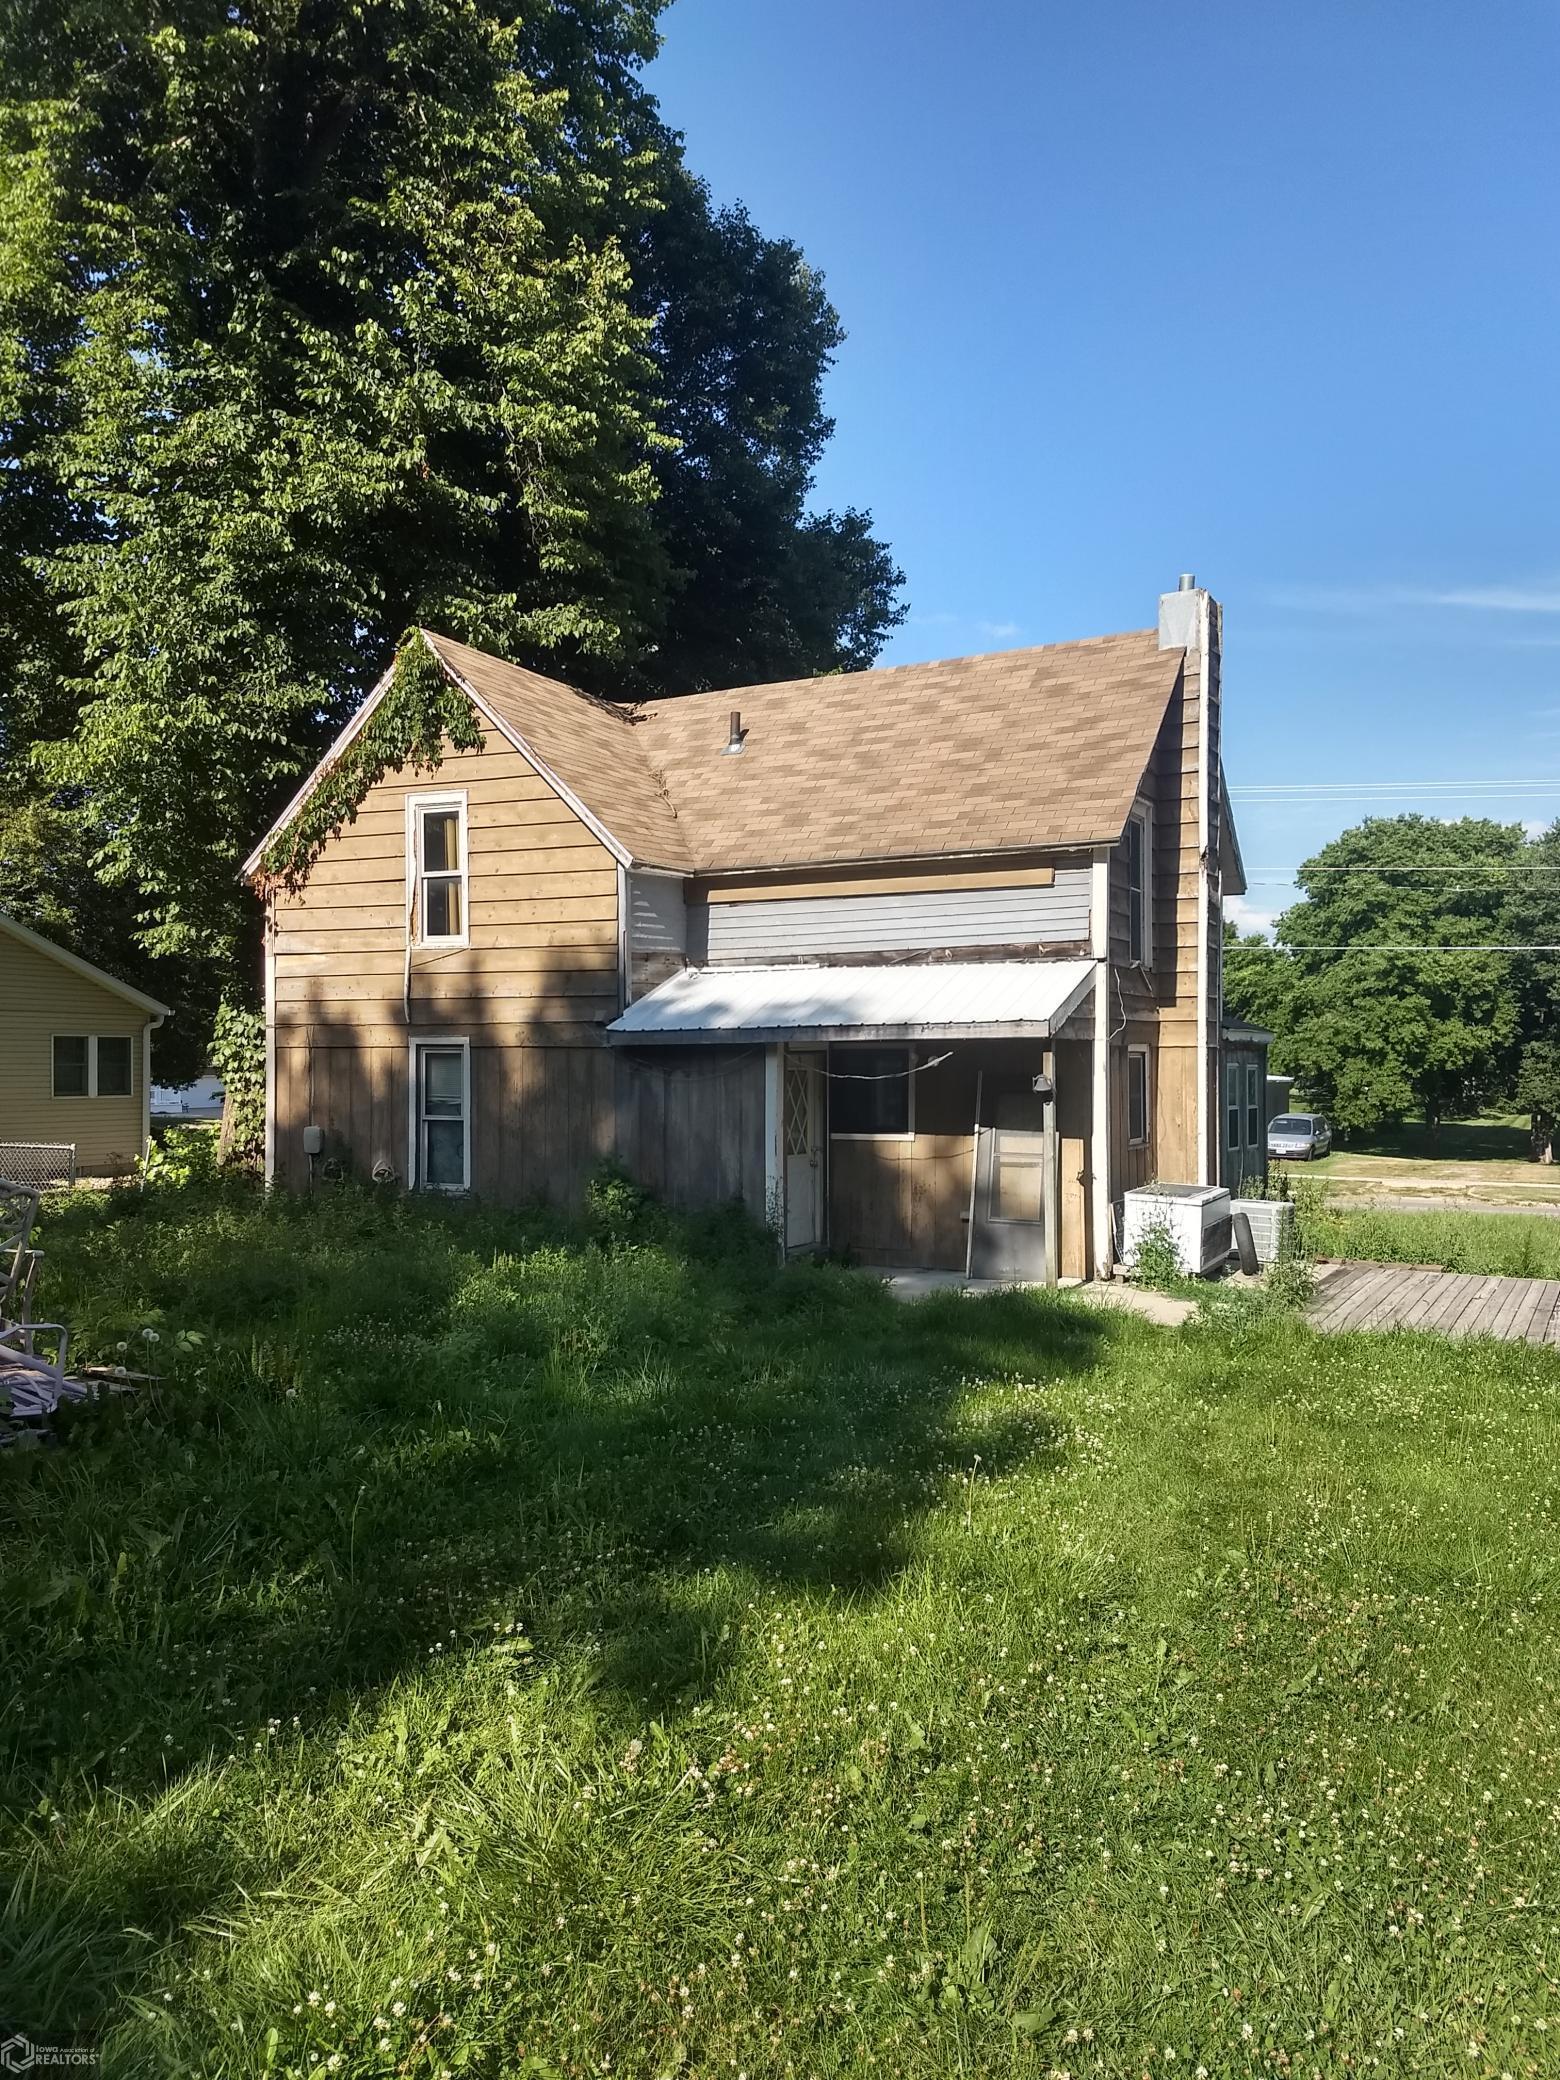 909 8th Property Photo - Clear Lake, IA real estate listing